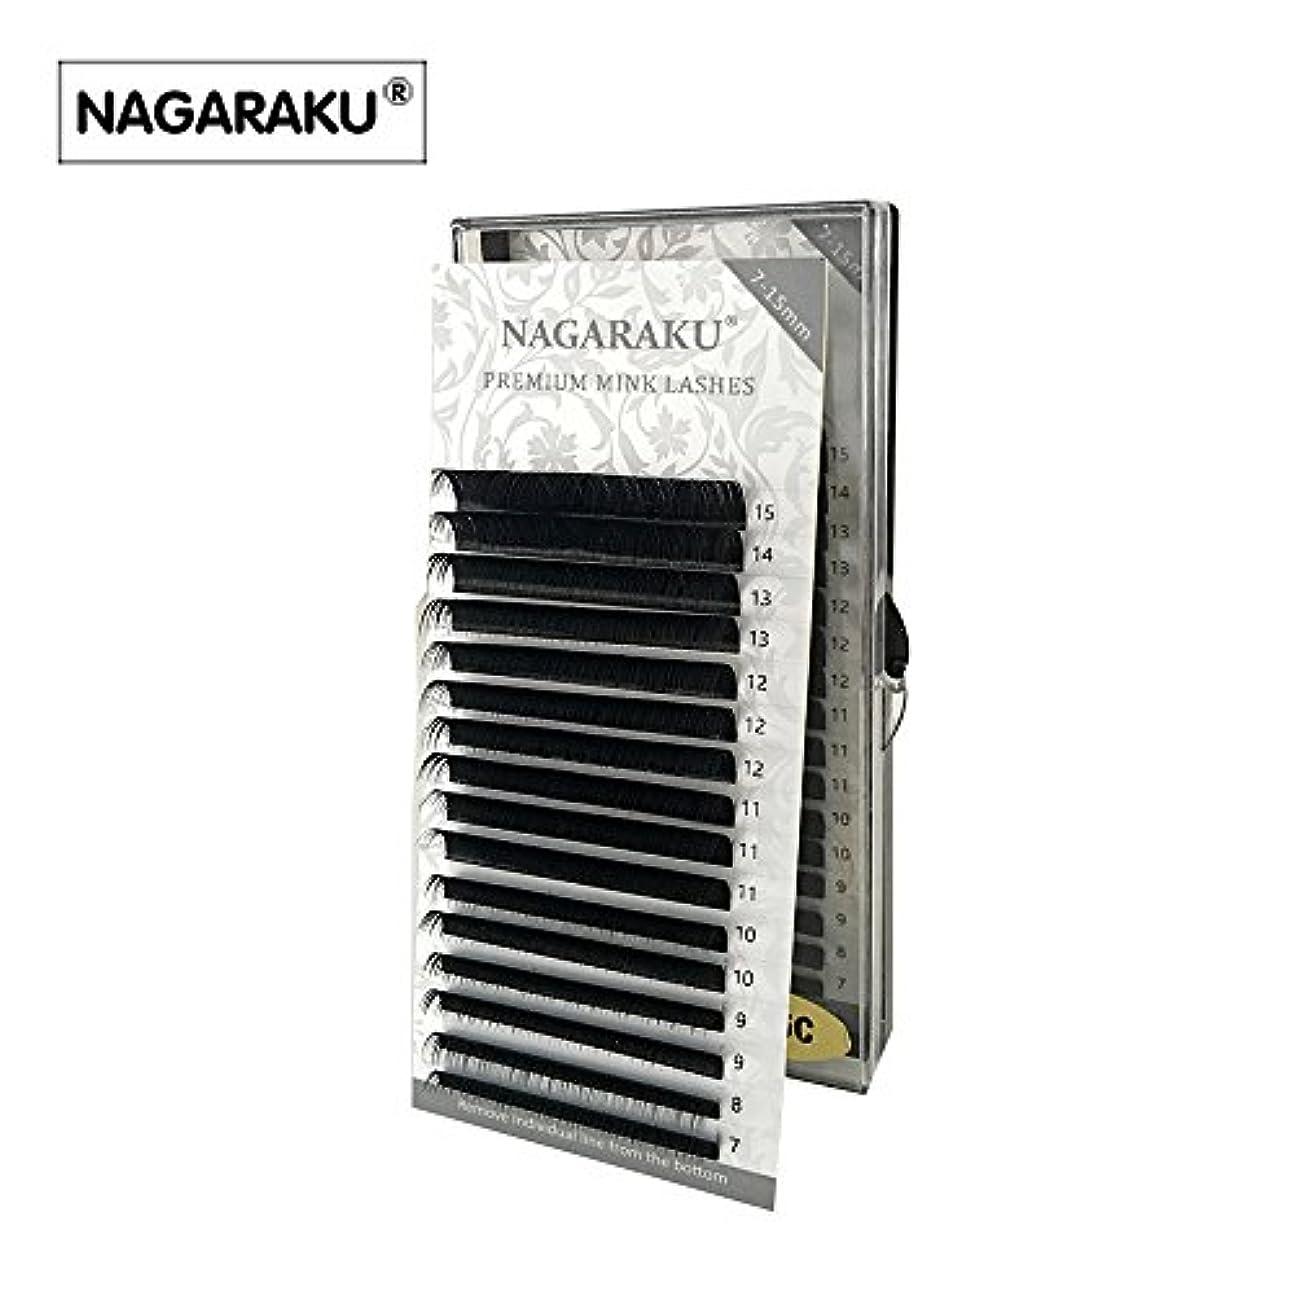 NAGARAKU 太さ0.07mm J カール 7~15mmミックス まつ毛エクステンション